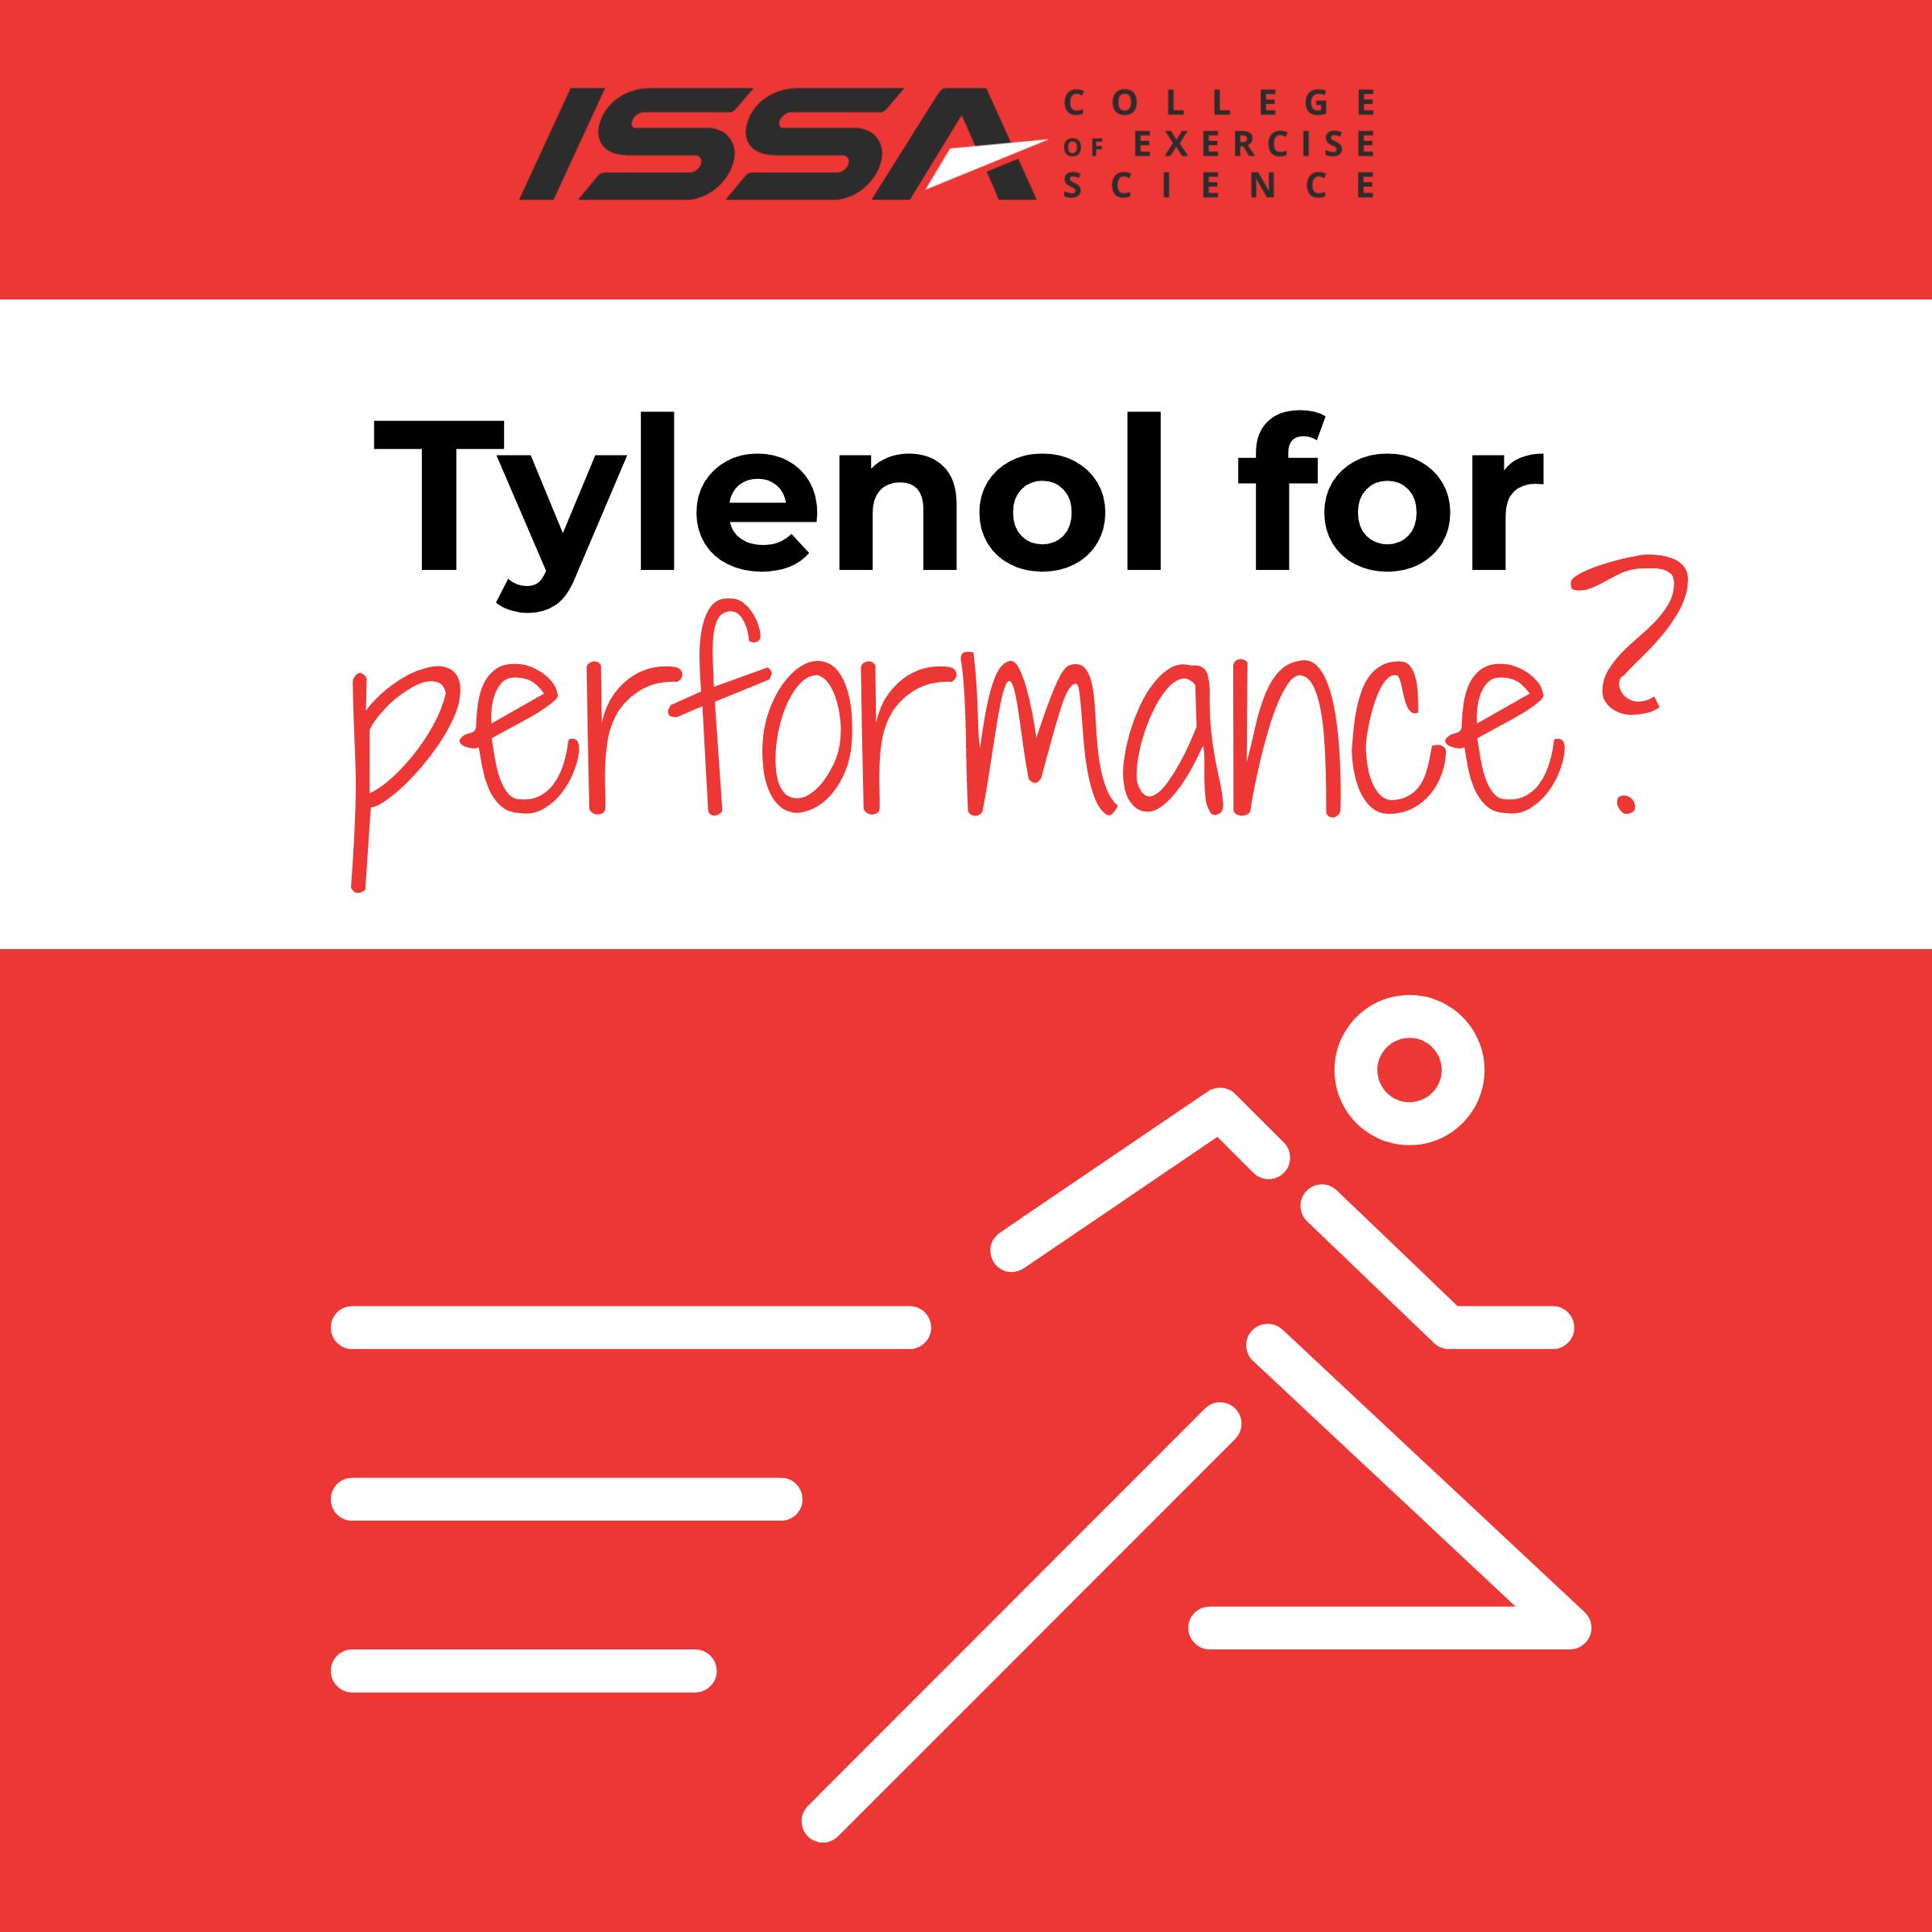 19-1008-tylenol